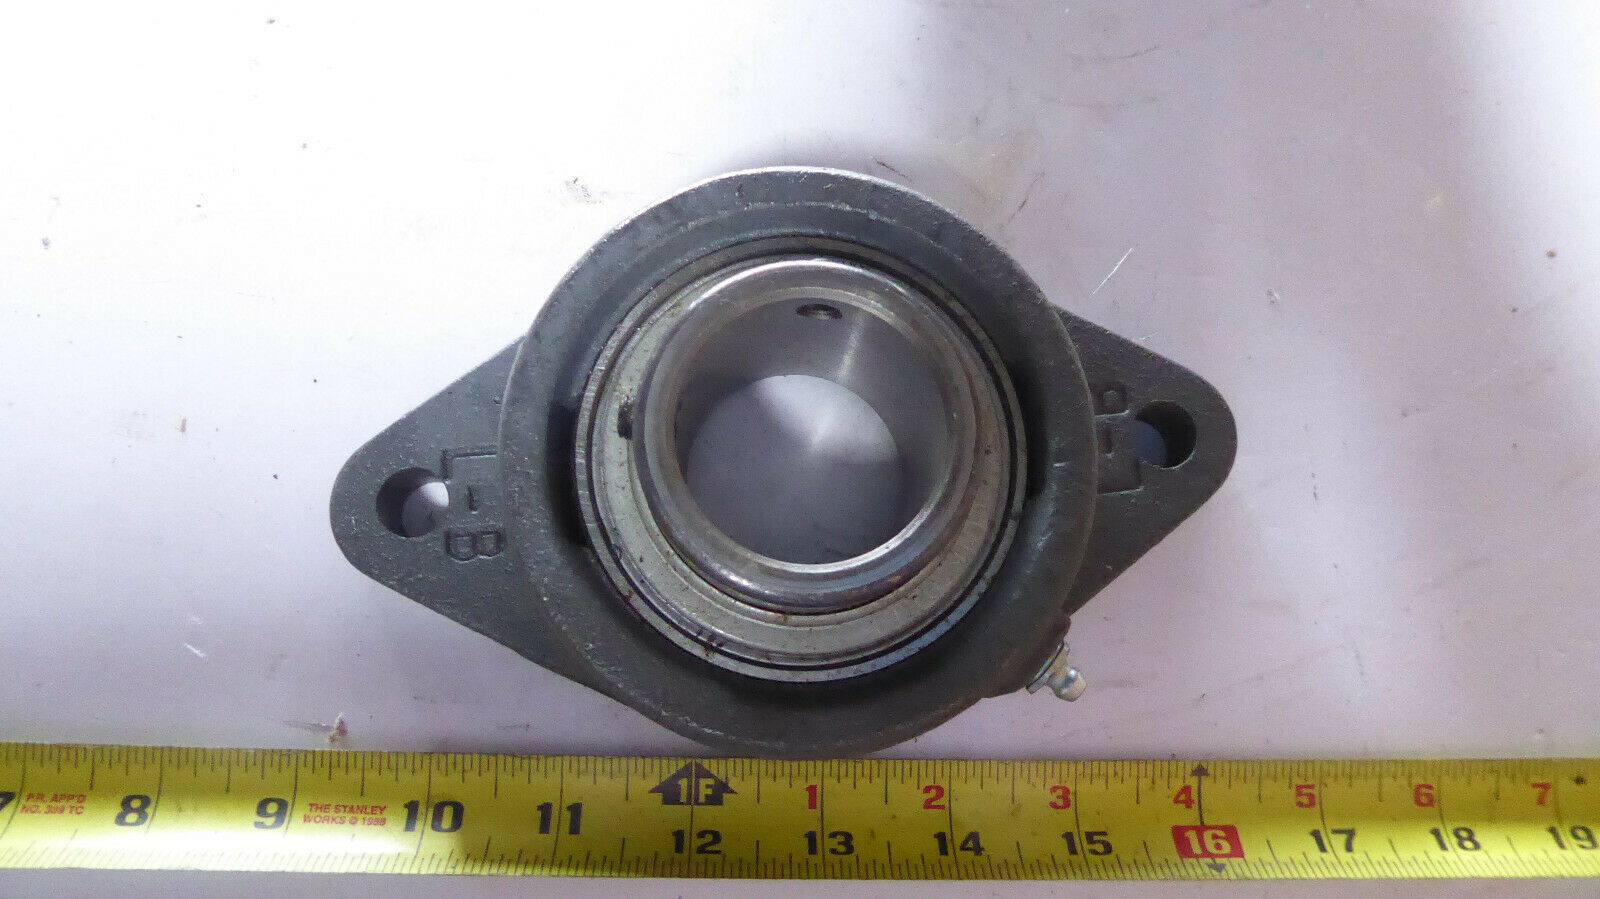 Link-Belt FX3U228N / FX3-U228N Ball Bearing Flange Unit New